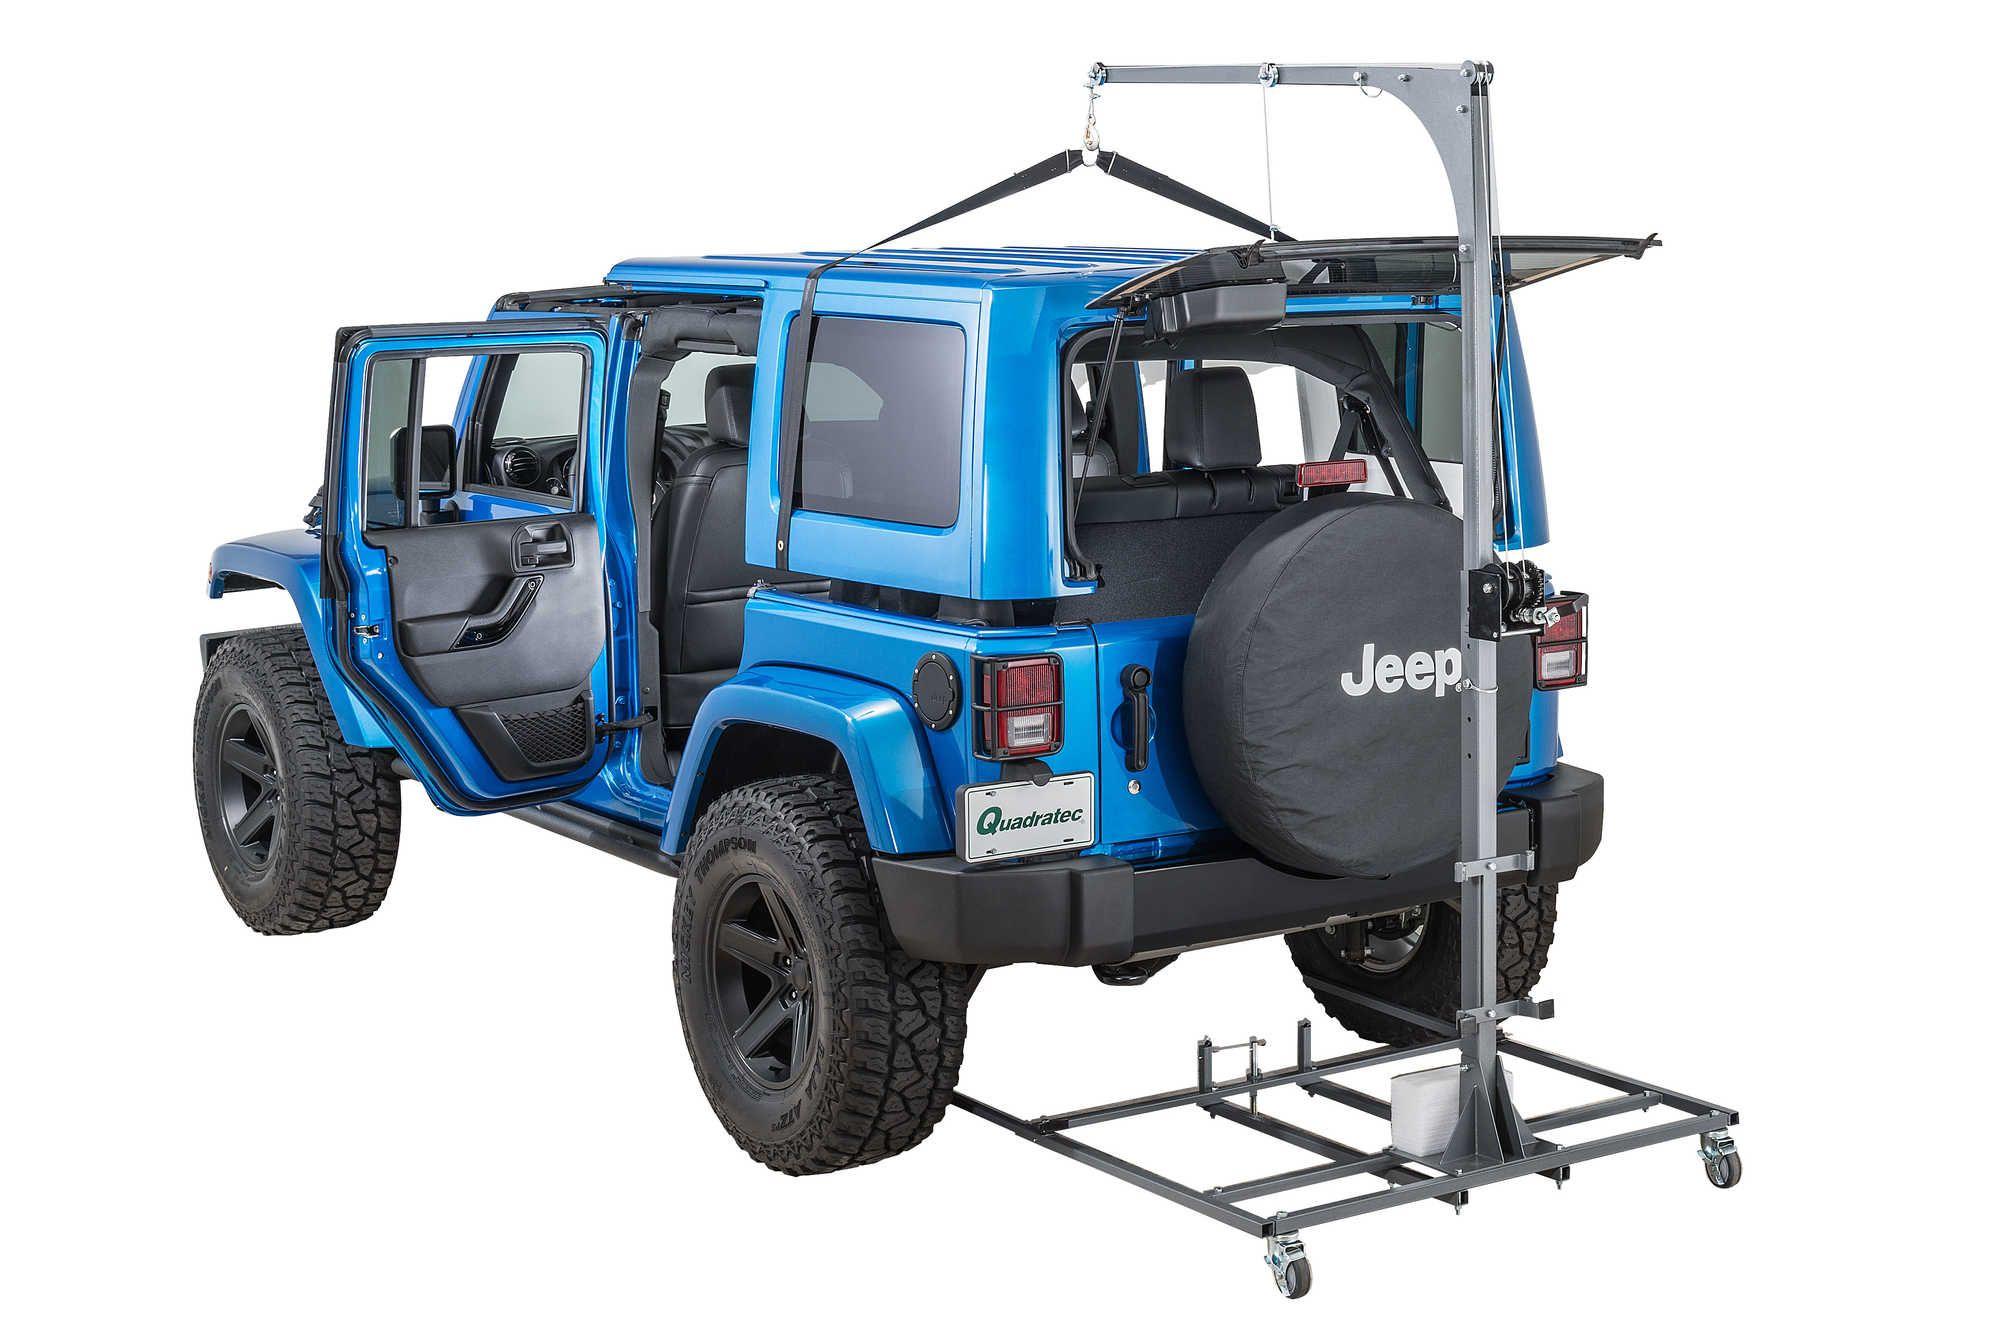 Lange Originals Hoist A Cart For 07 16 Jeep Wrangler Wrangler